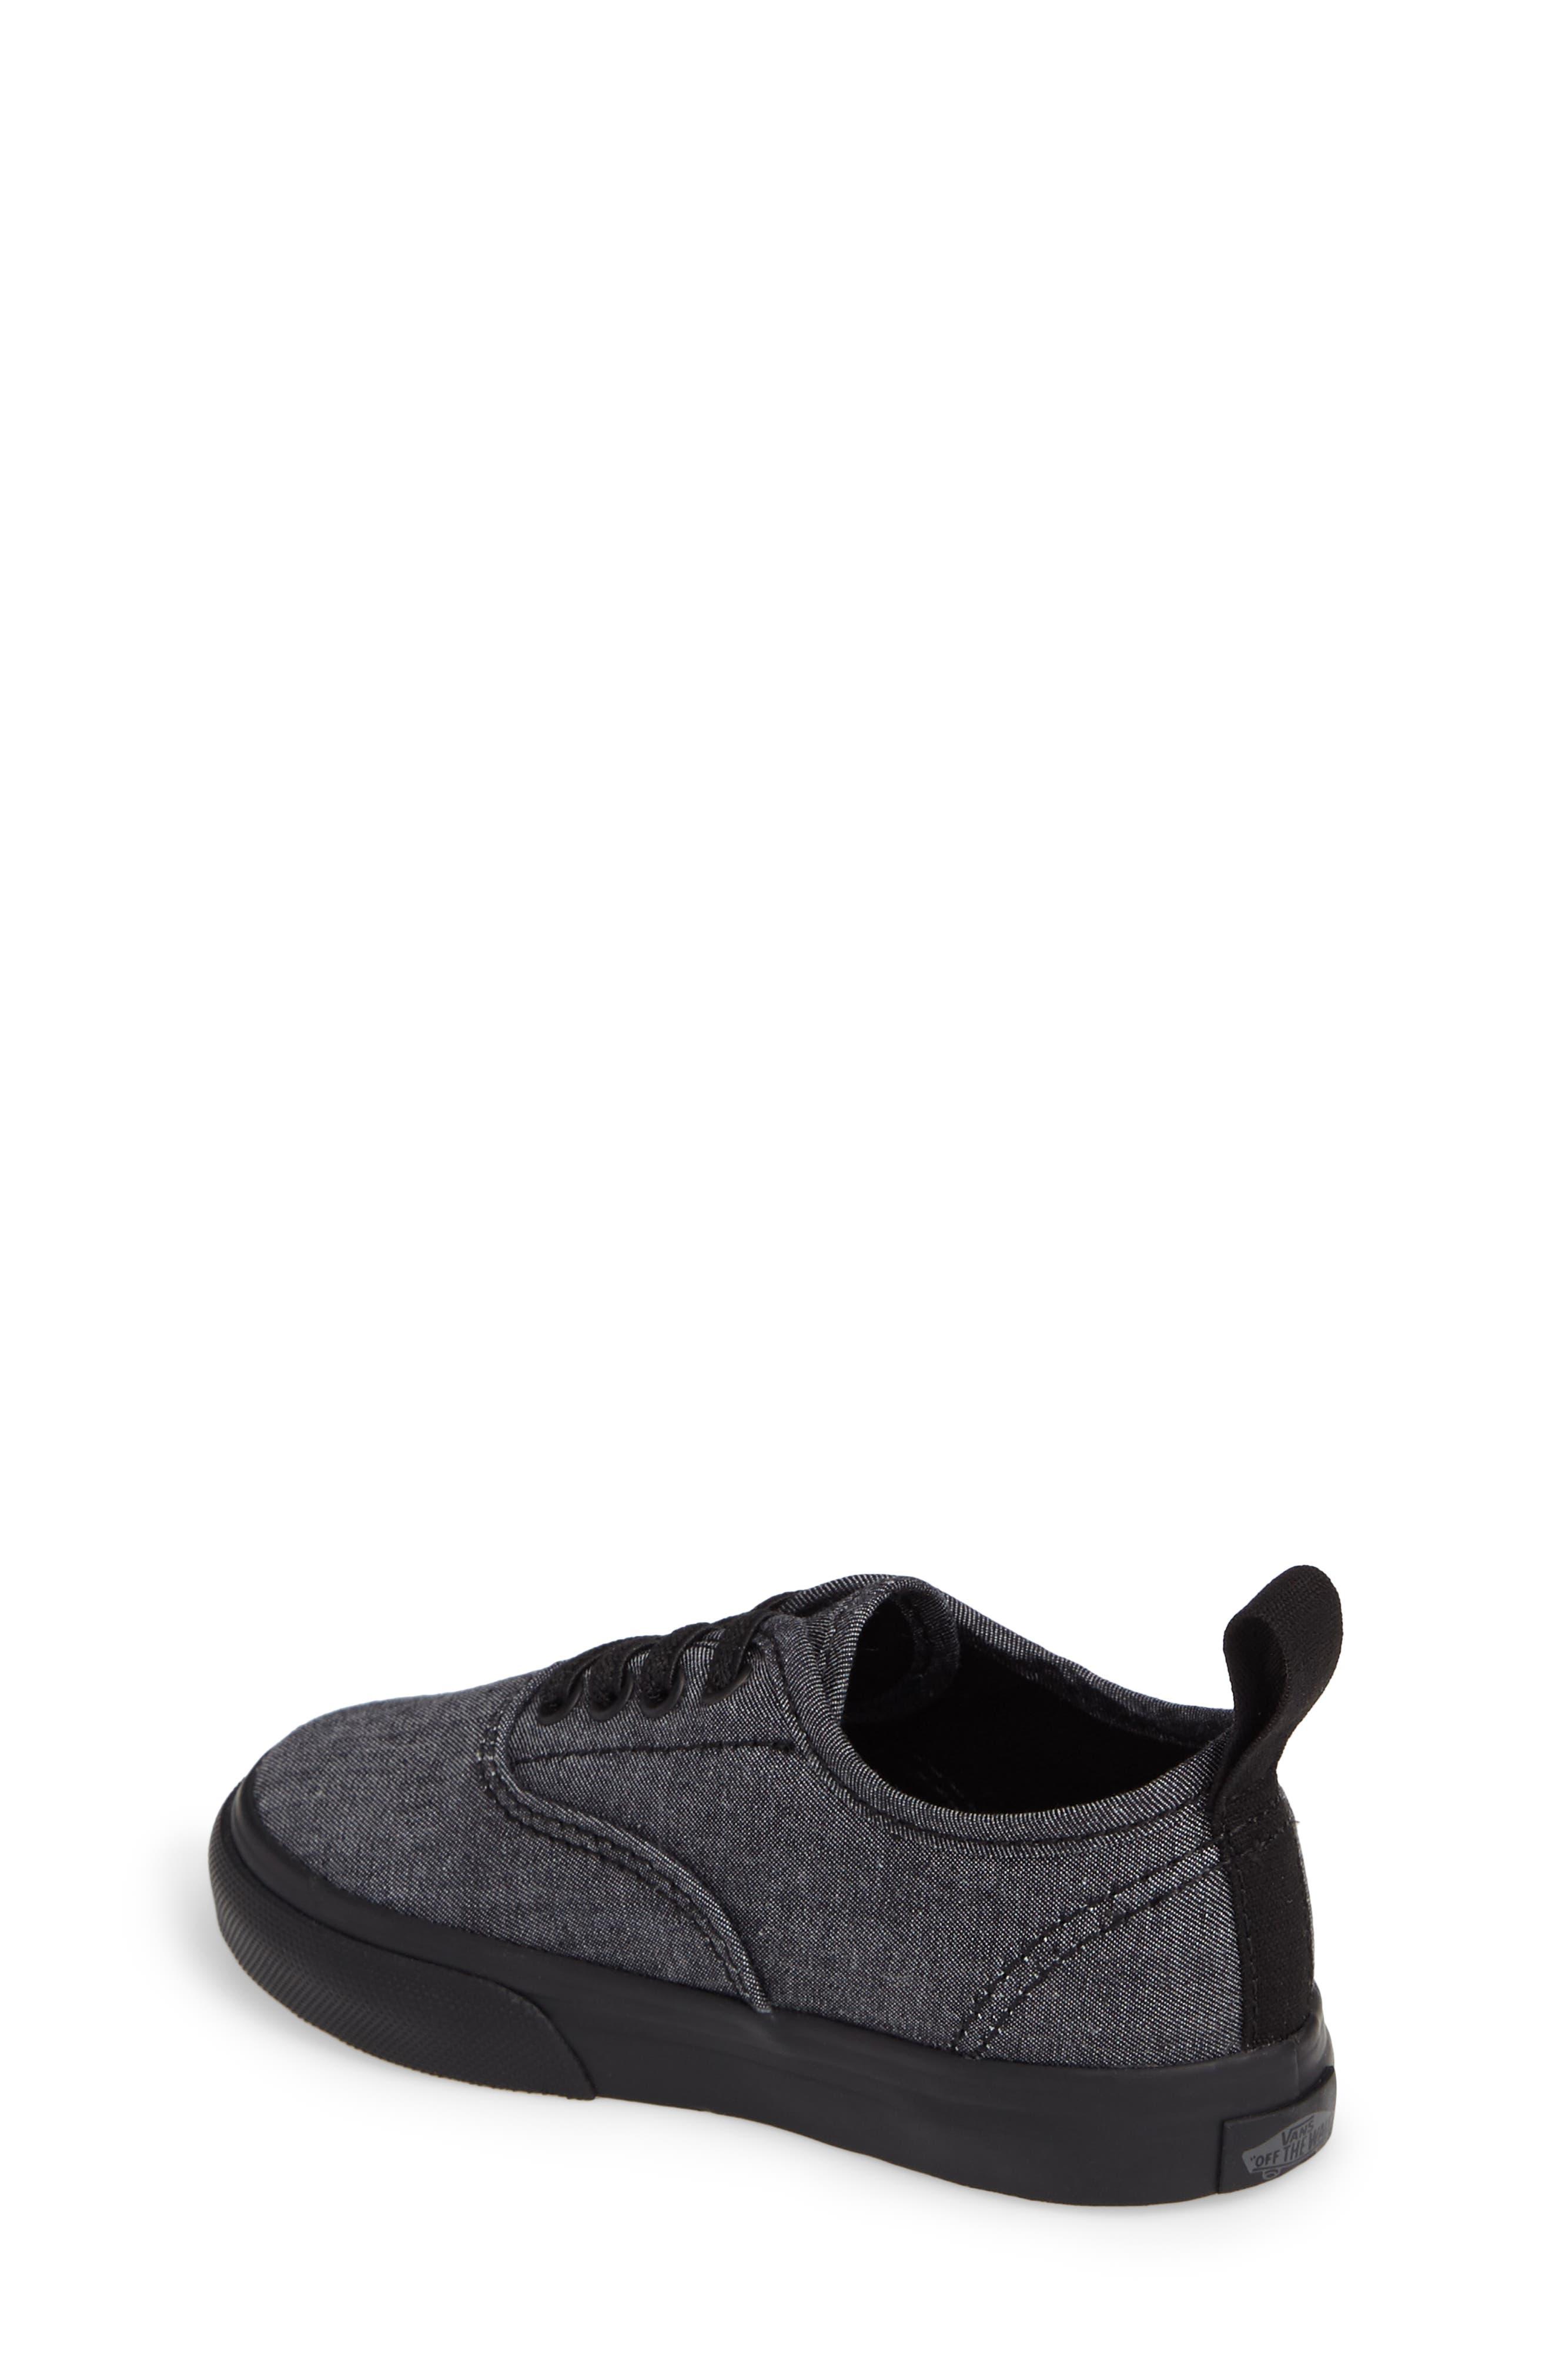 'Authentic' Sneaker,                             Alternate thumbnail 2, color,                             010